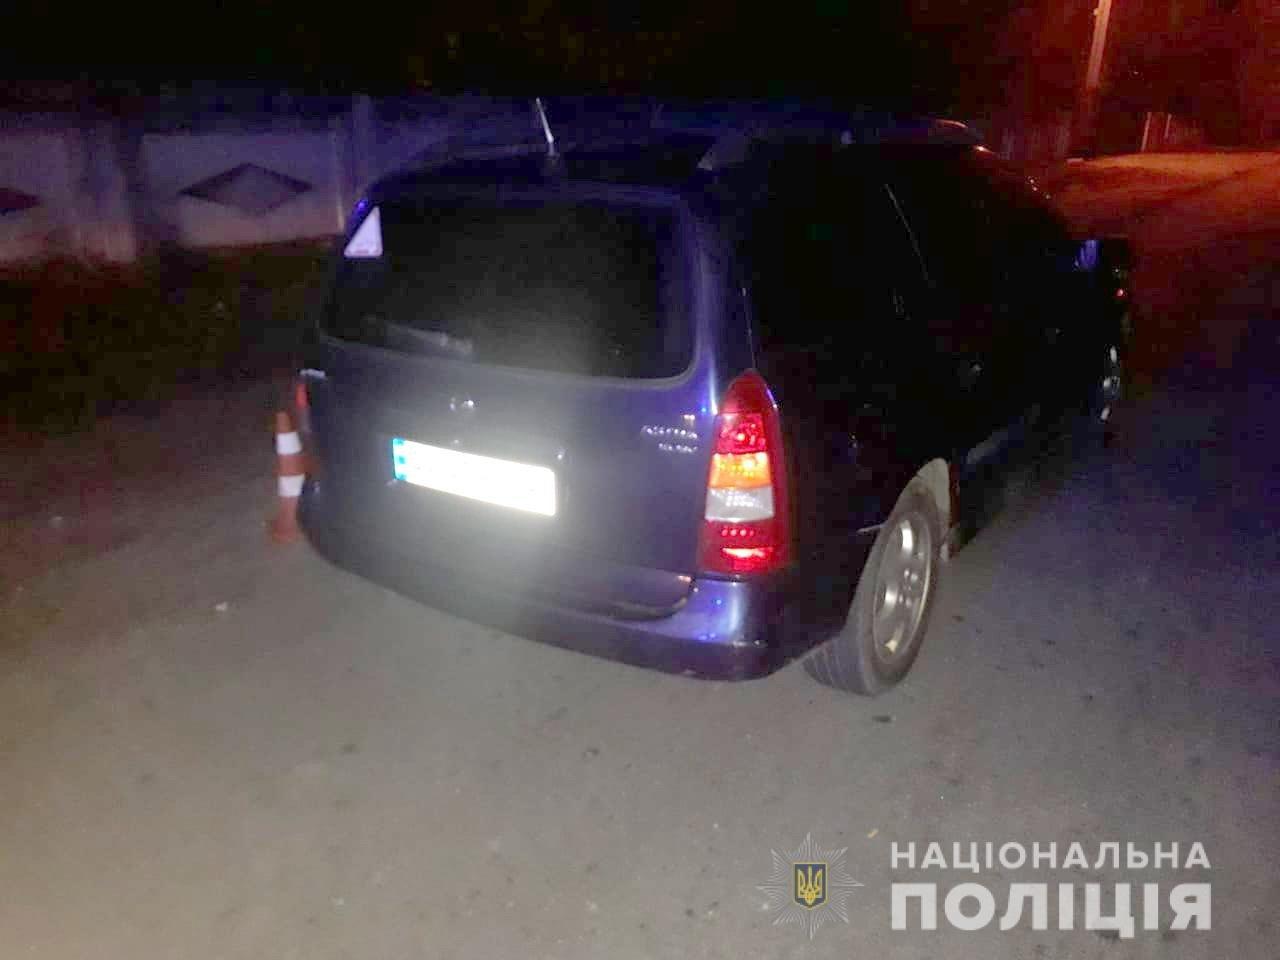 На Харьковщине во время ДТП погибли три человека, - ФОТО, фото-2